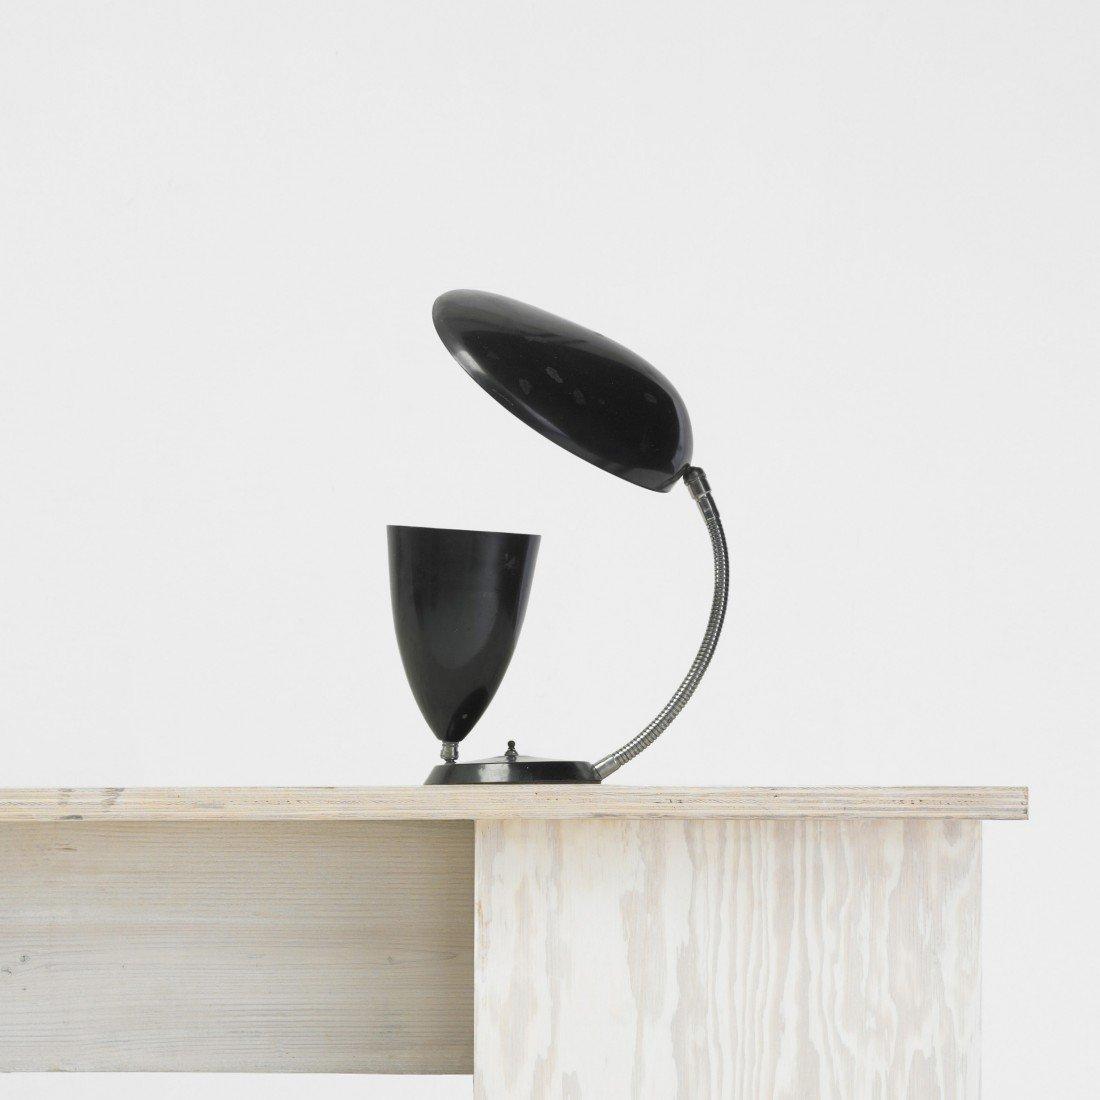 106: Greta  Magnusson Grossman table lamp